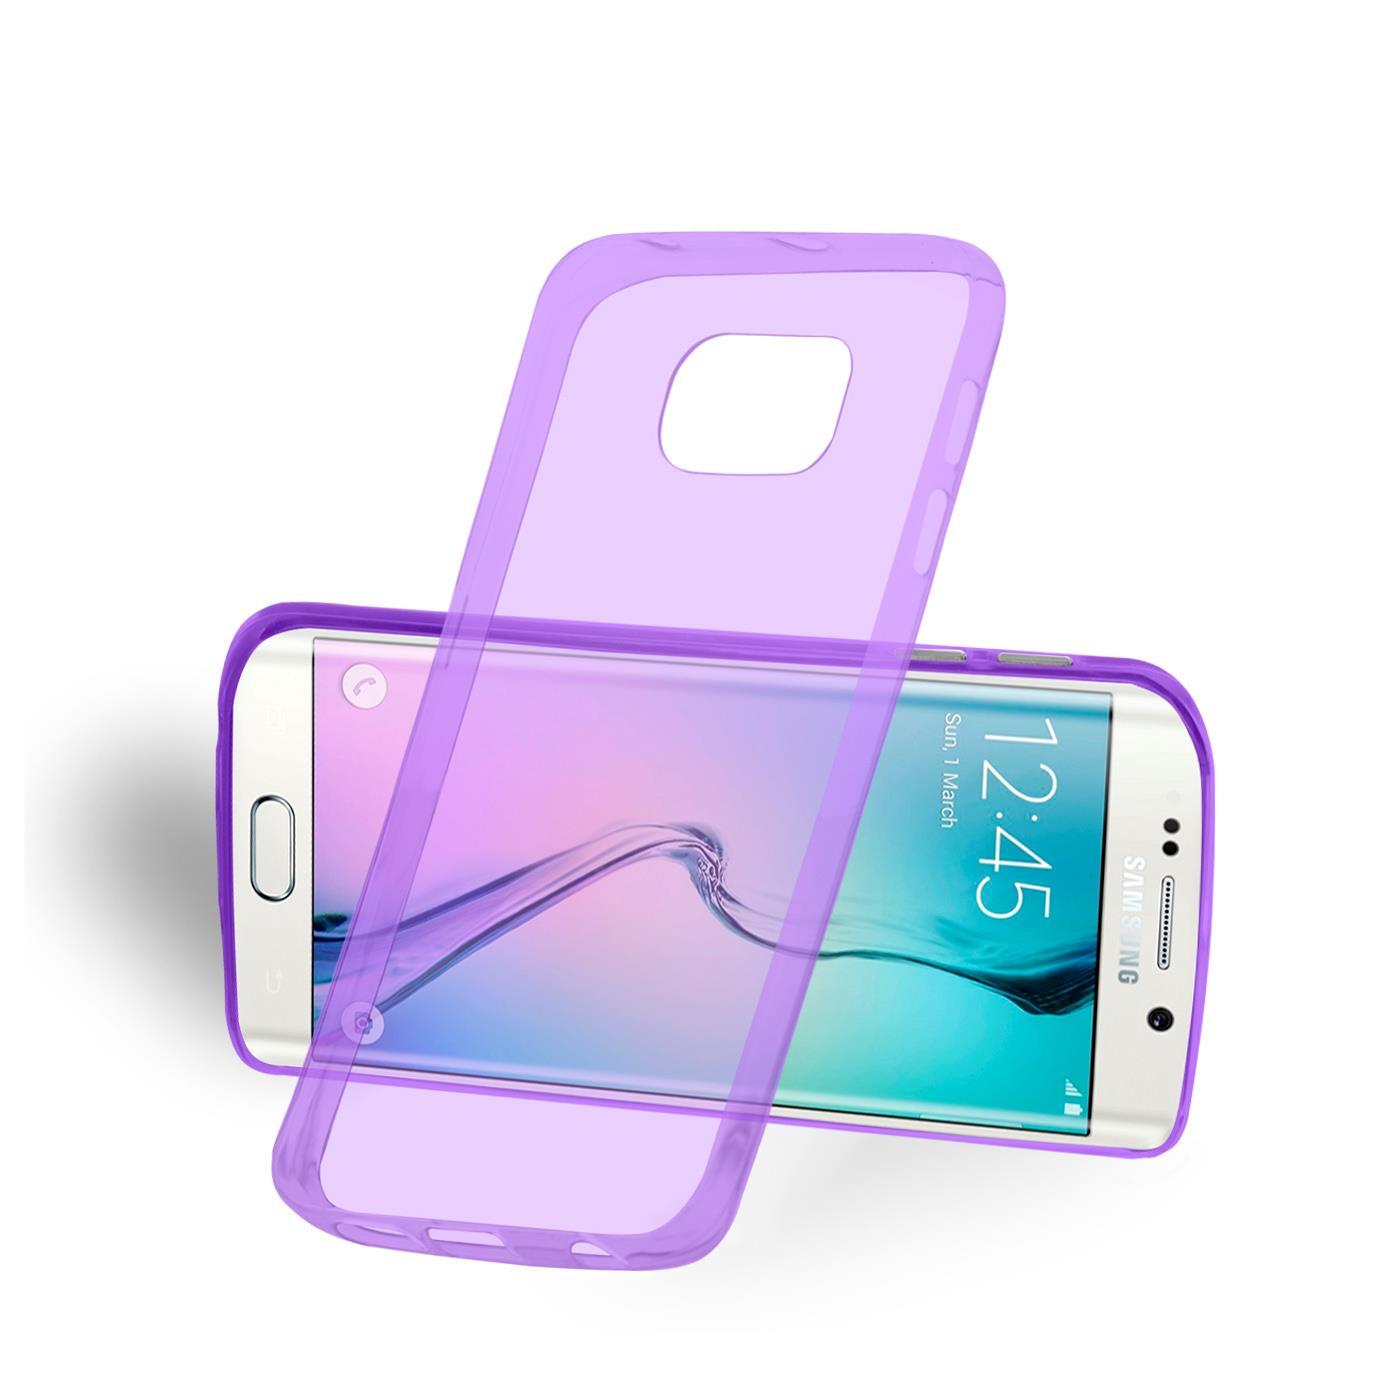 Samsung-Galaxy-s6-Edge-Plus-Thin-Silikon-Klar-Case-Cover-Ultra-Slim-Stossfeste Indexbild 21